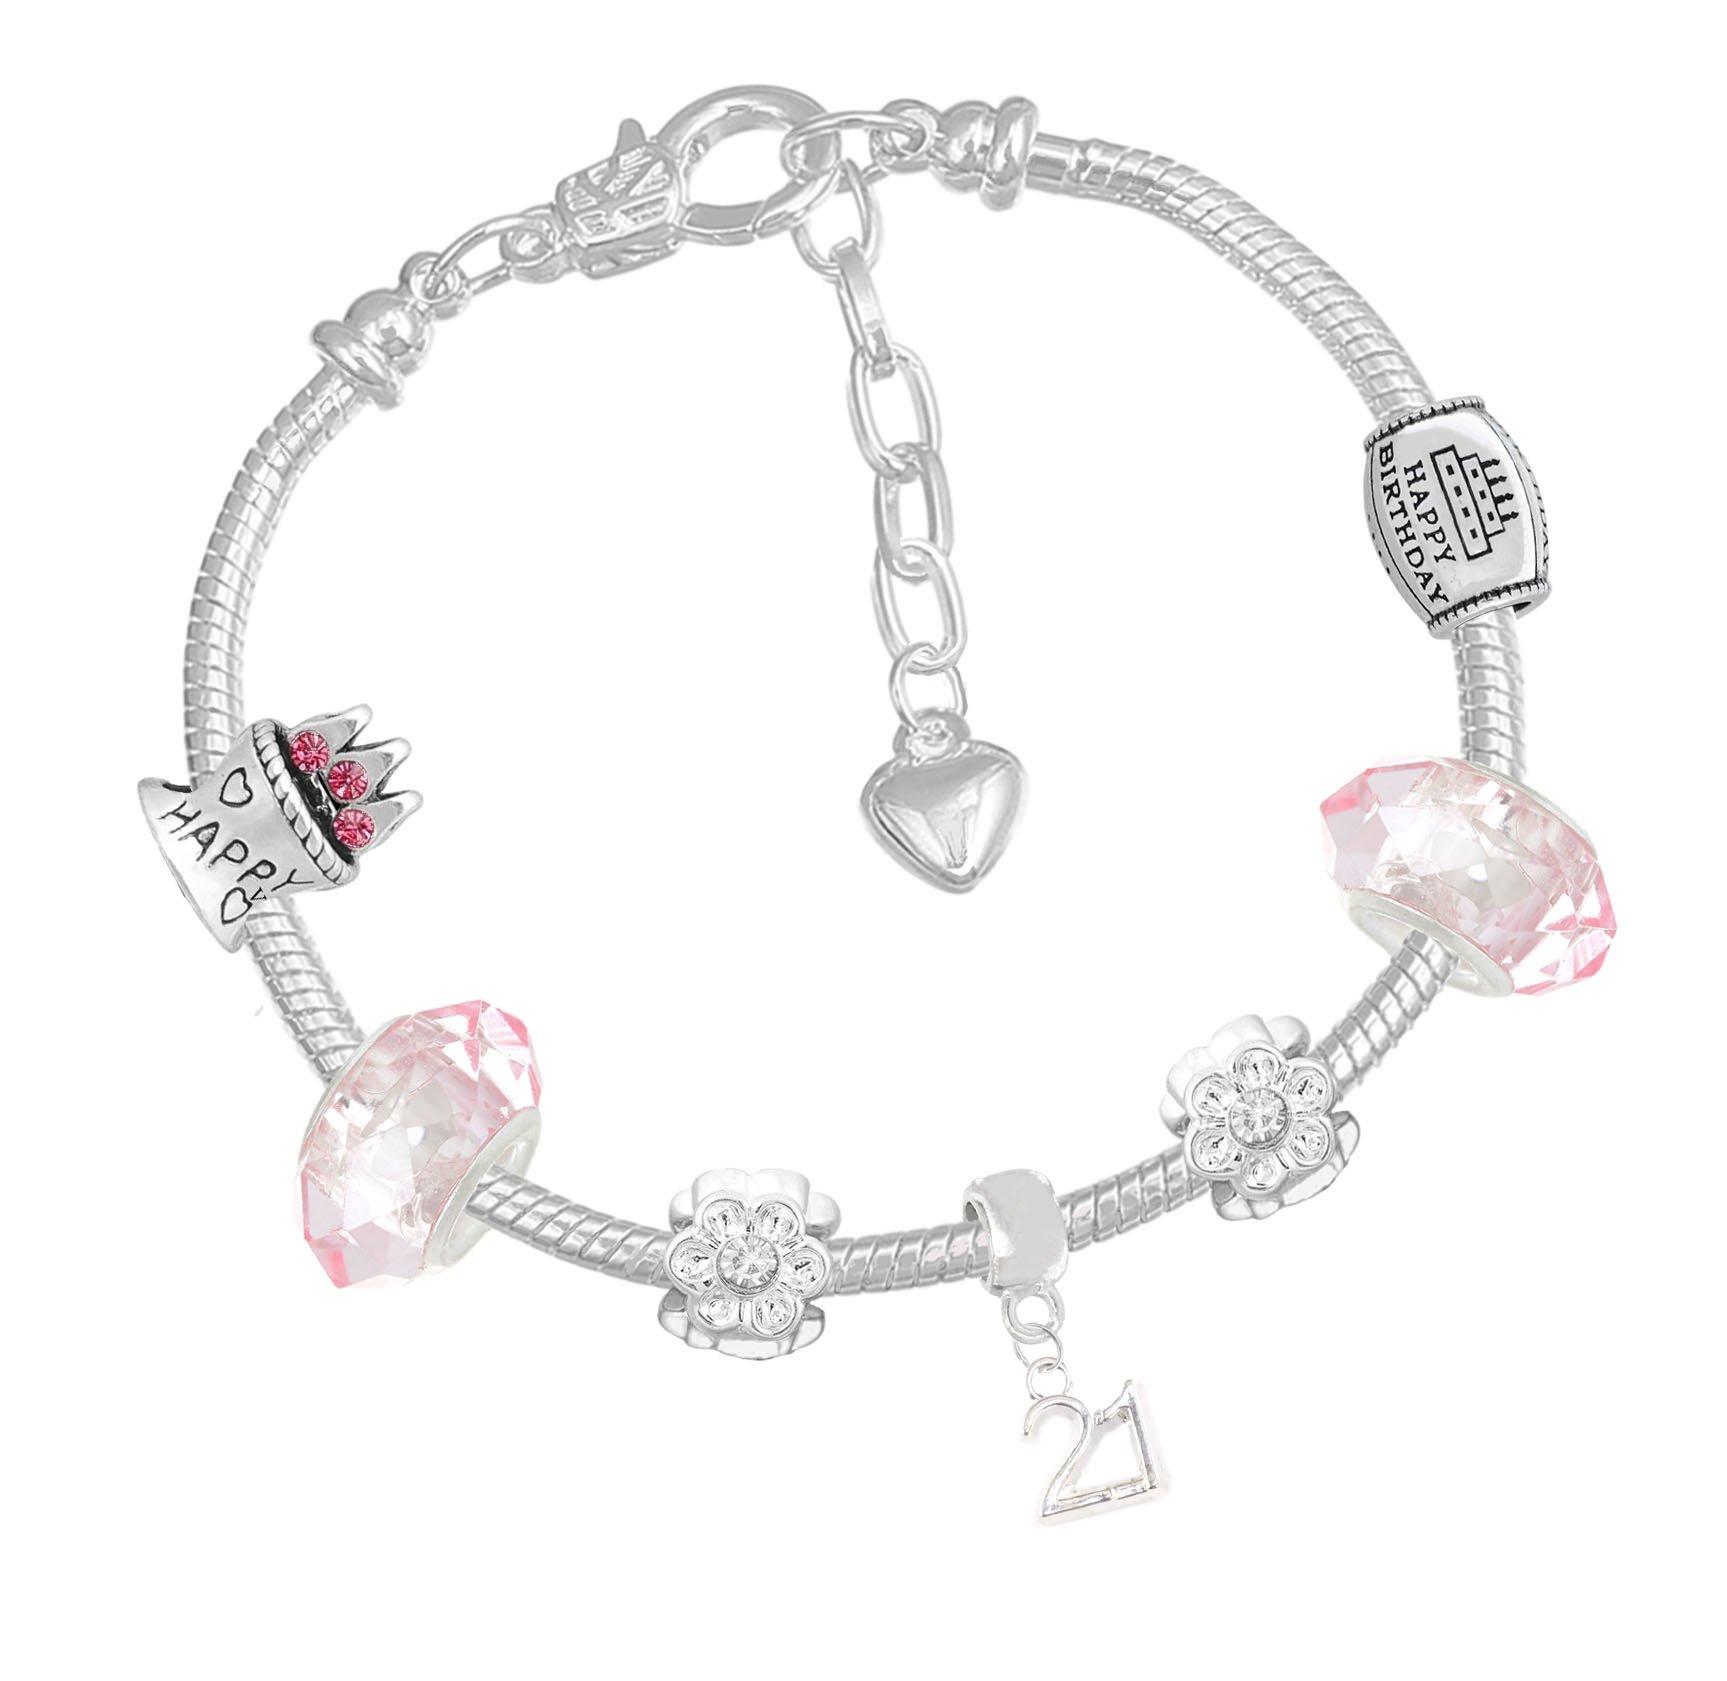 Charm Buddy Sparkly Ladies 21st Birthday Pink Silver Gift Box Charm Bracelet Birthday Card Set